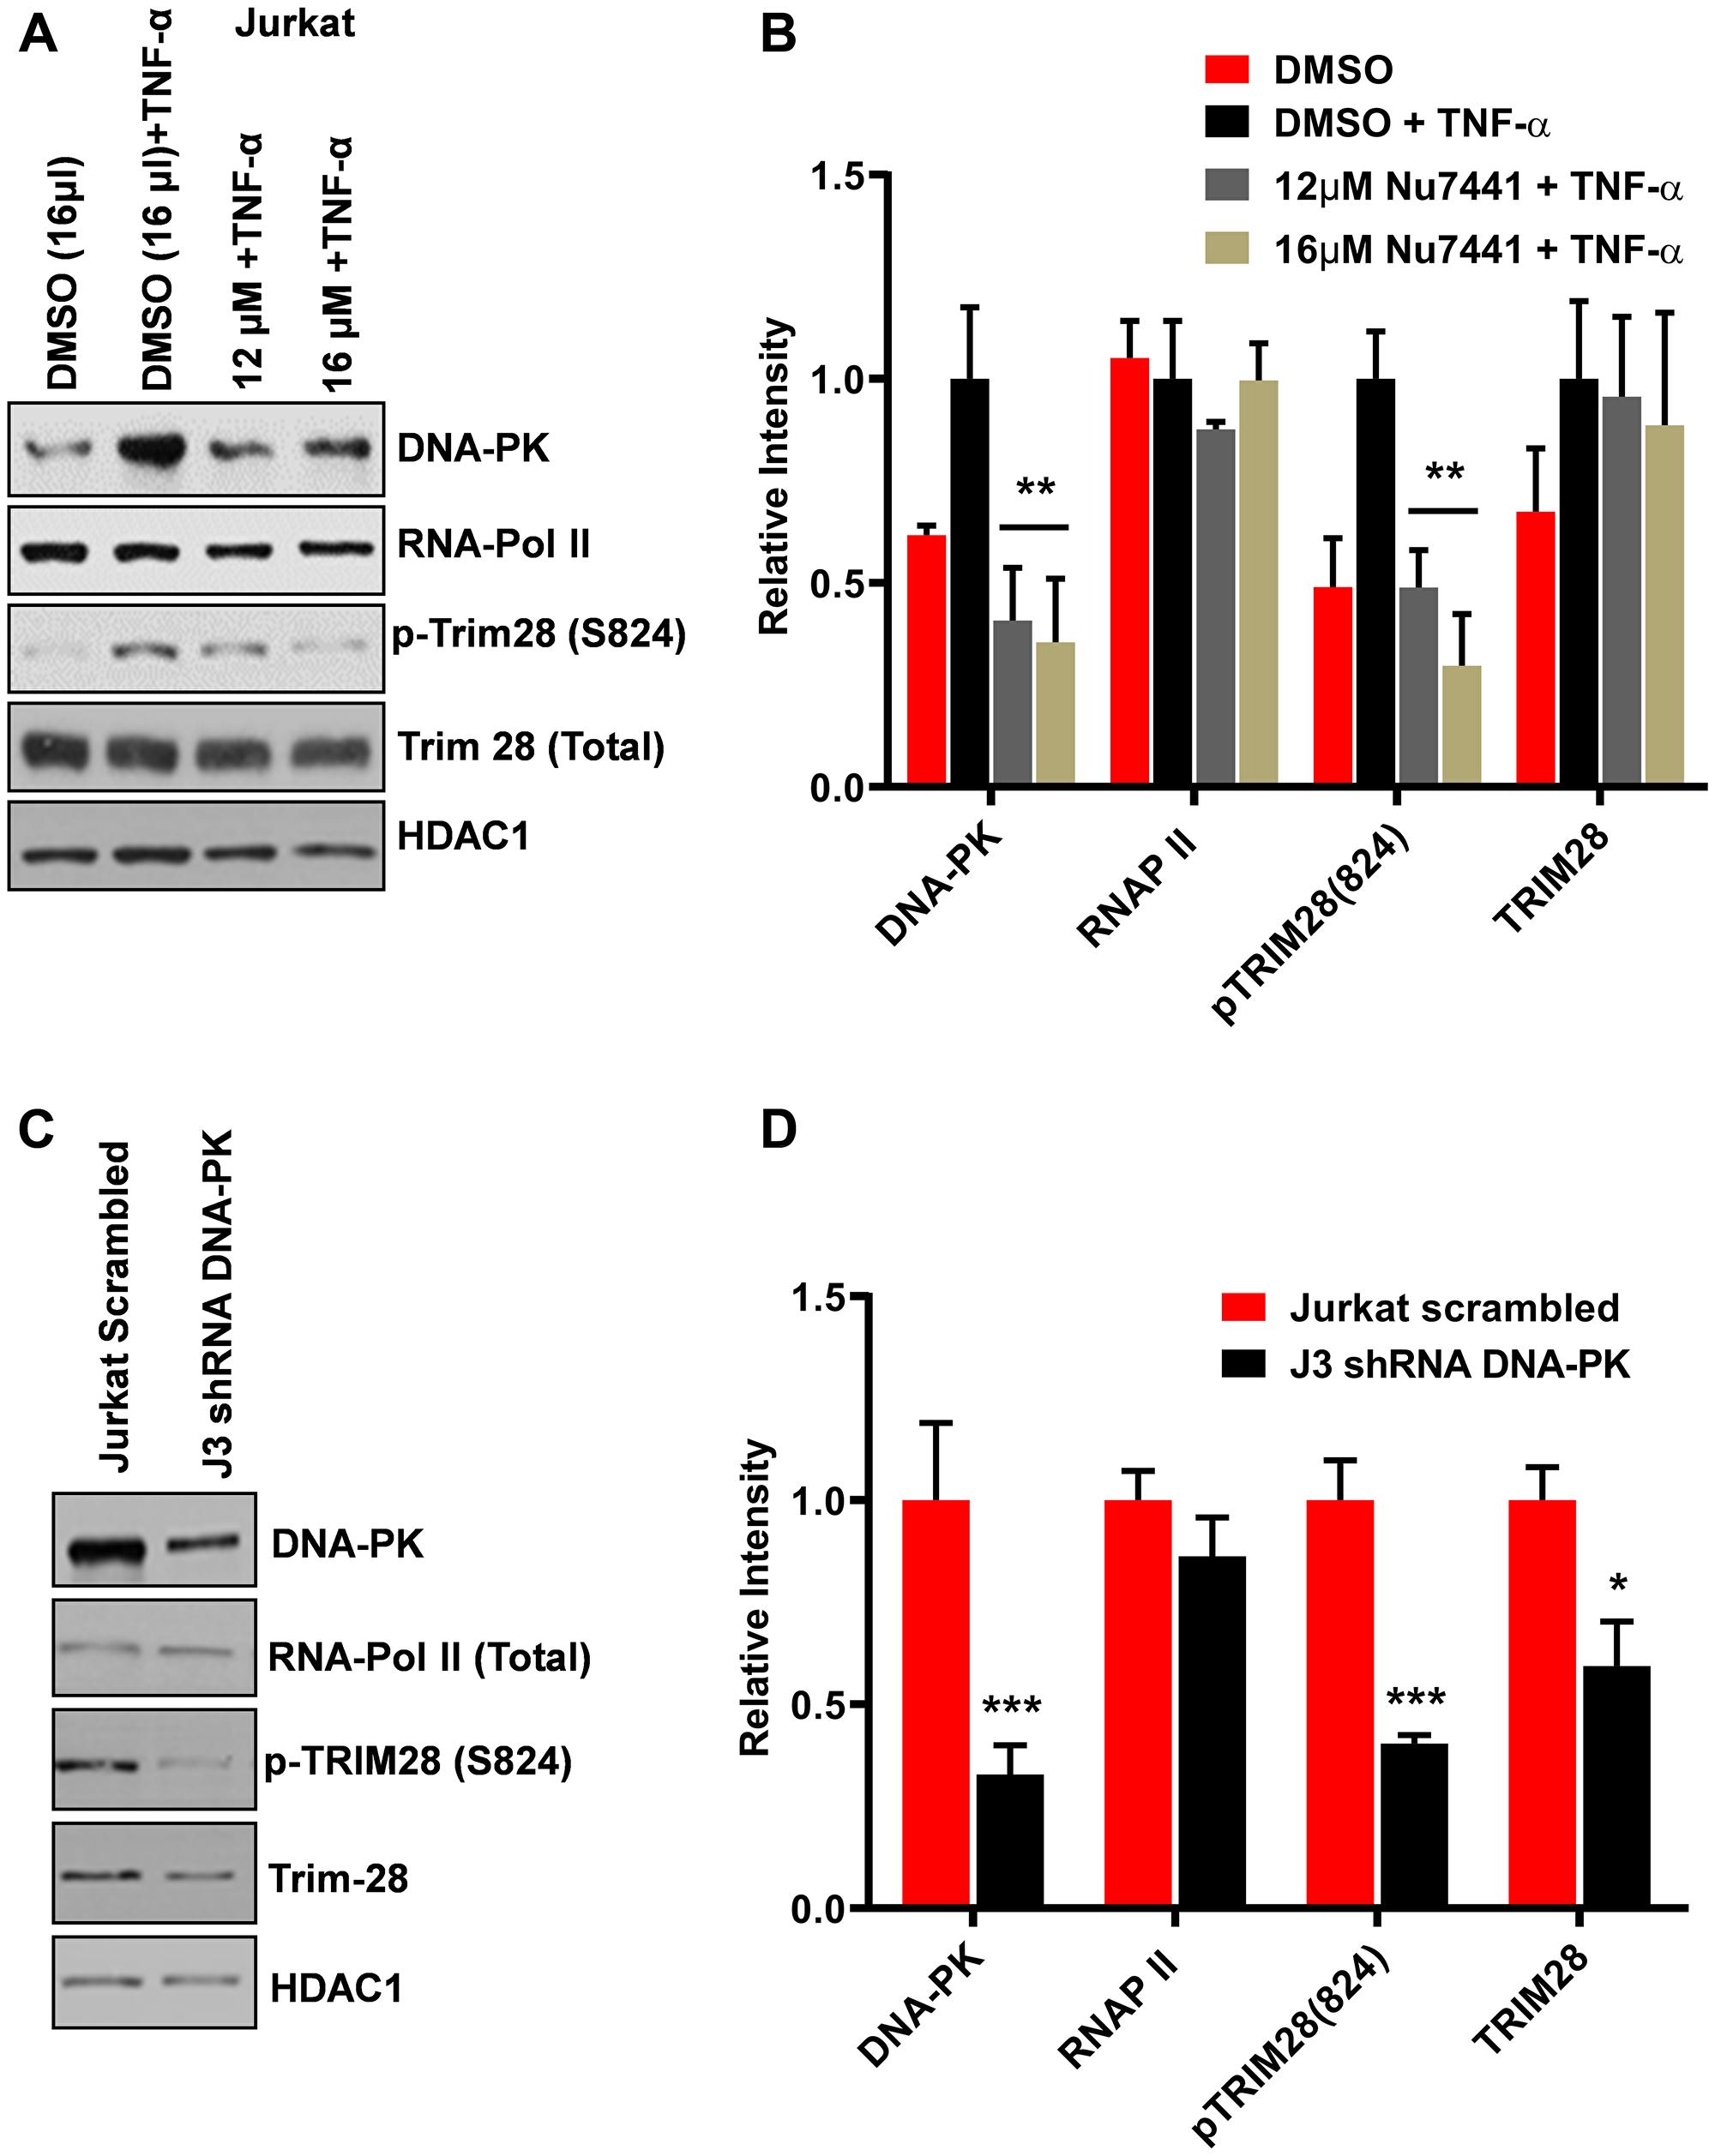 DNA-PK catalyzes the phosphorylation of TRIM28.